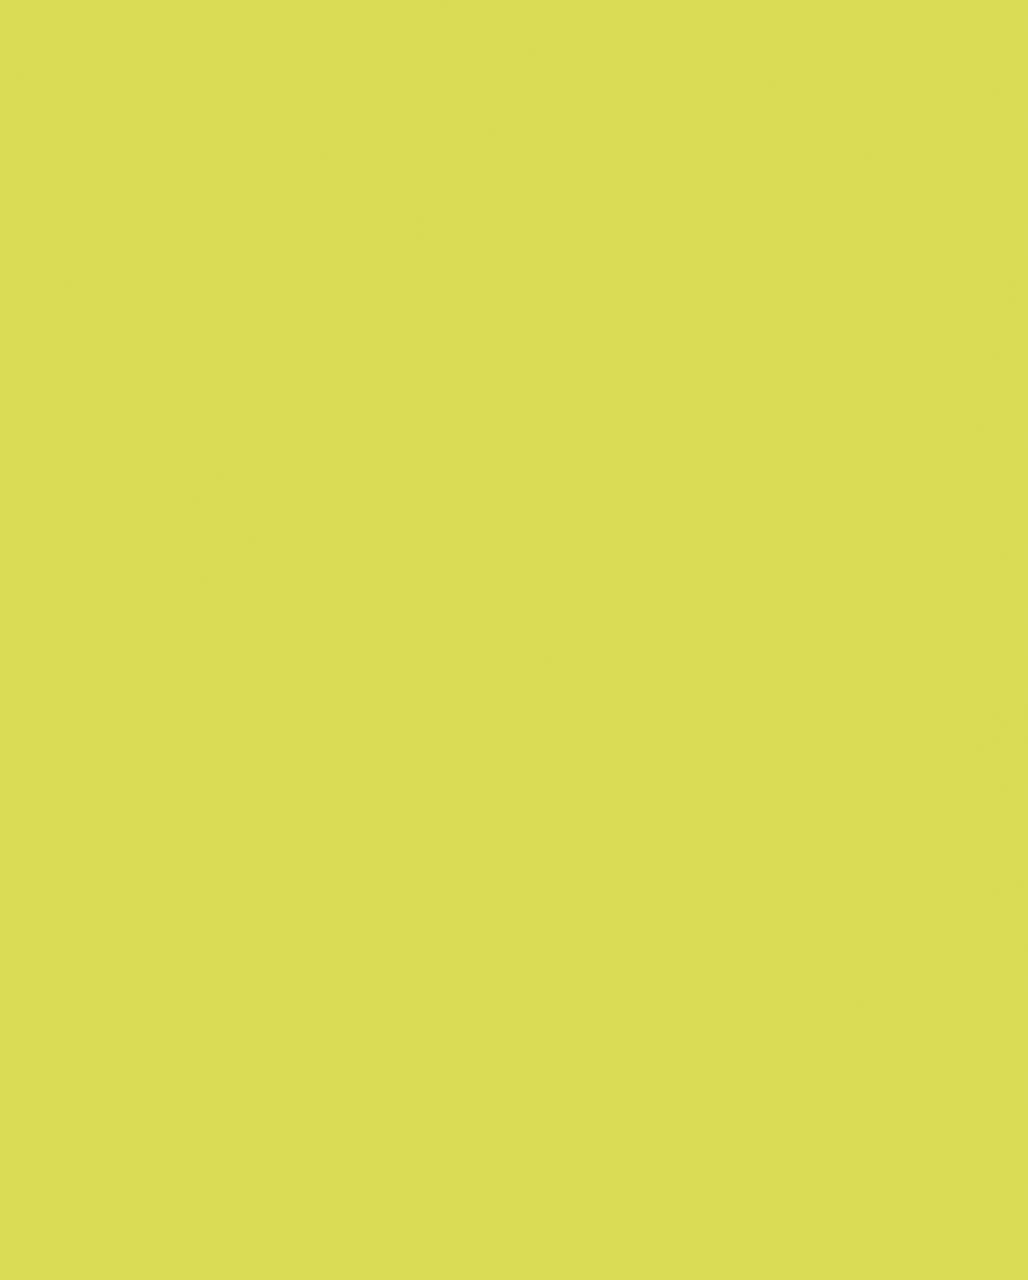 5519 Lime Grass (MF PB sample)